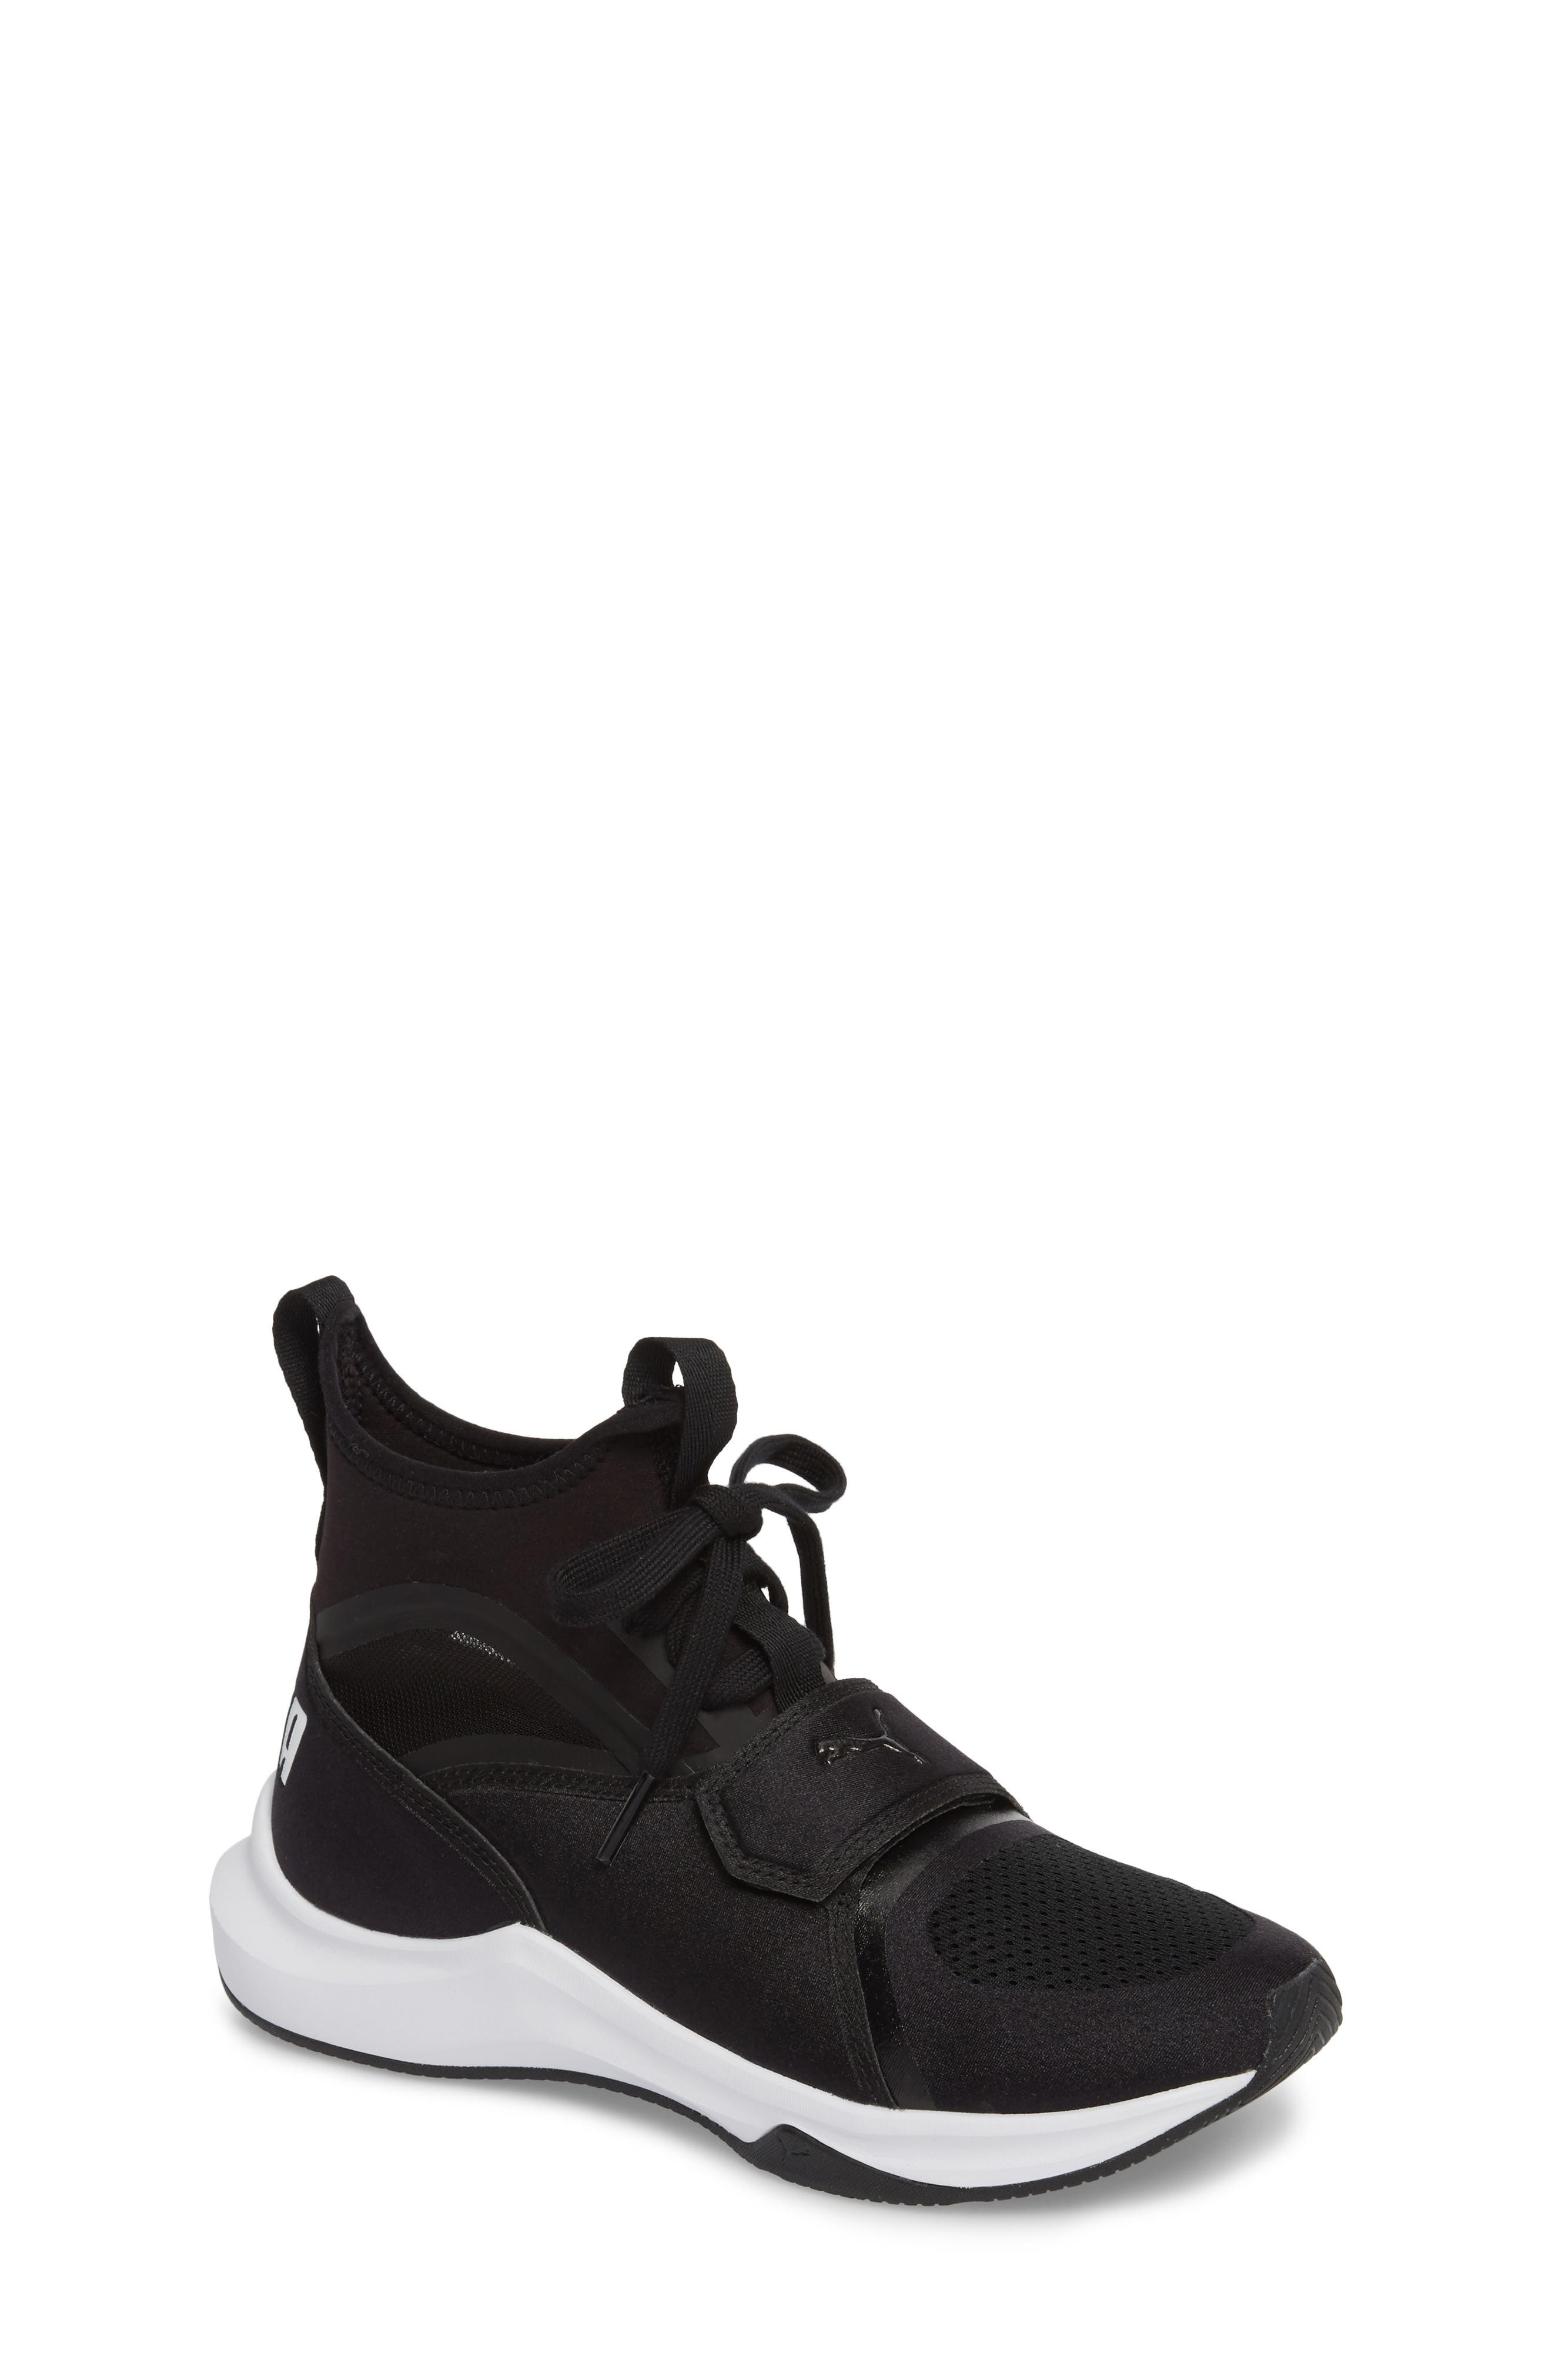 Phenom Jr High Top Sneaker,                             Main thumbnail 1, color,                             001